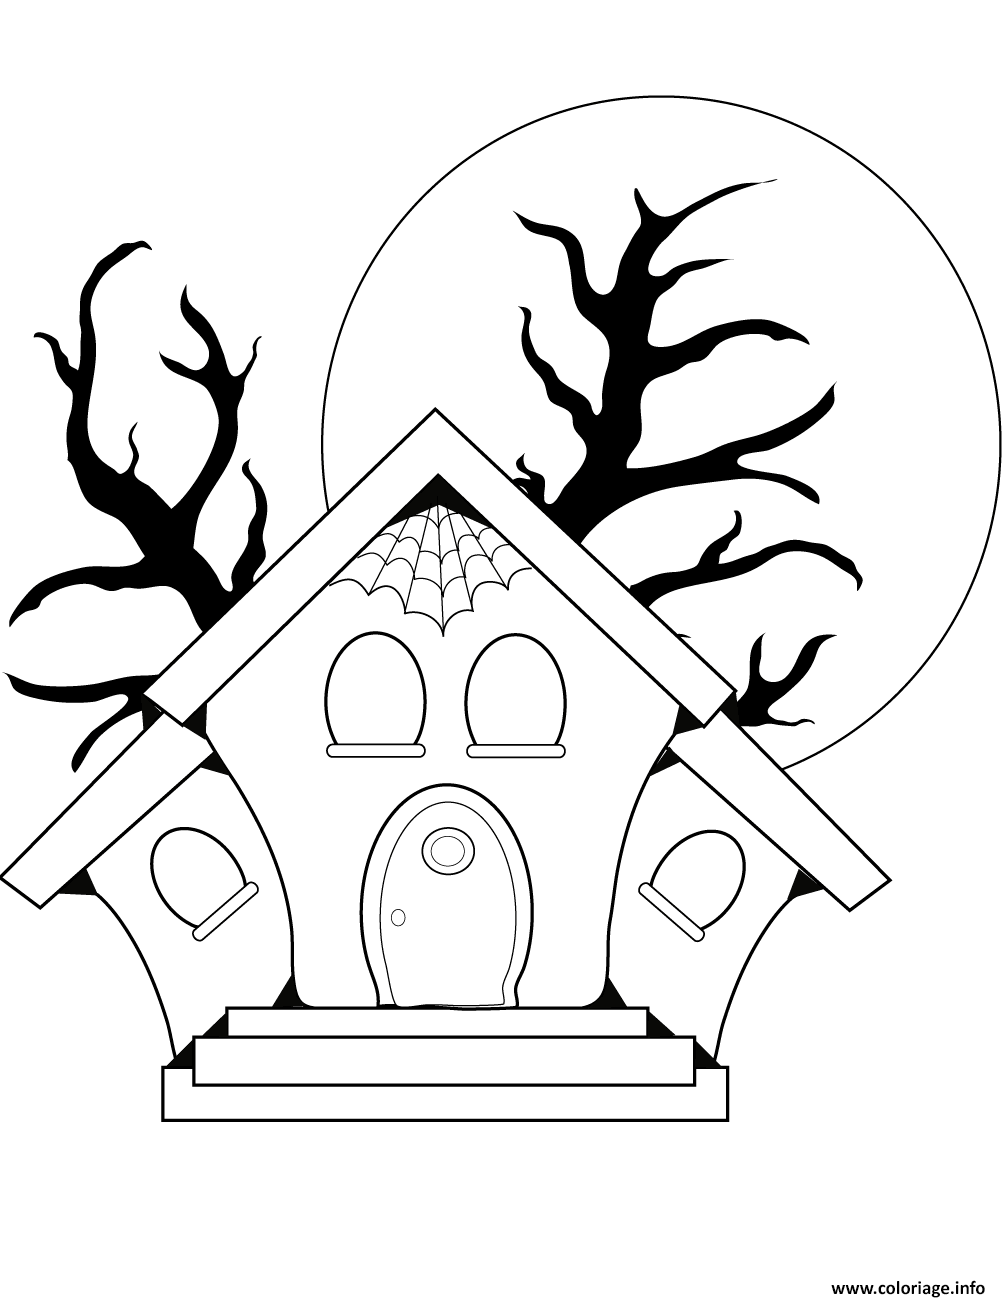 Coloriage maison hantee halloween dessin - Dessin de maison hantee ...